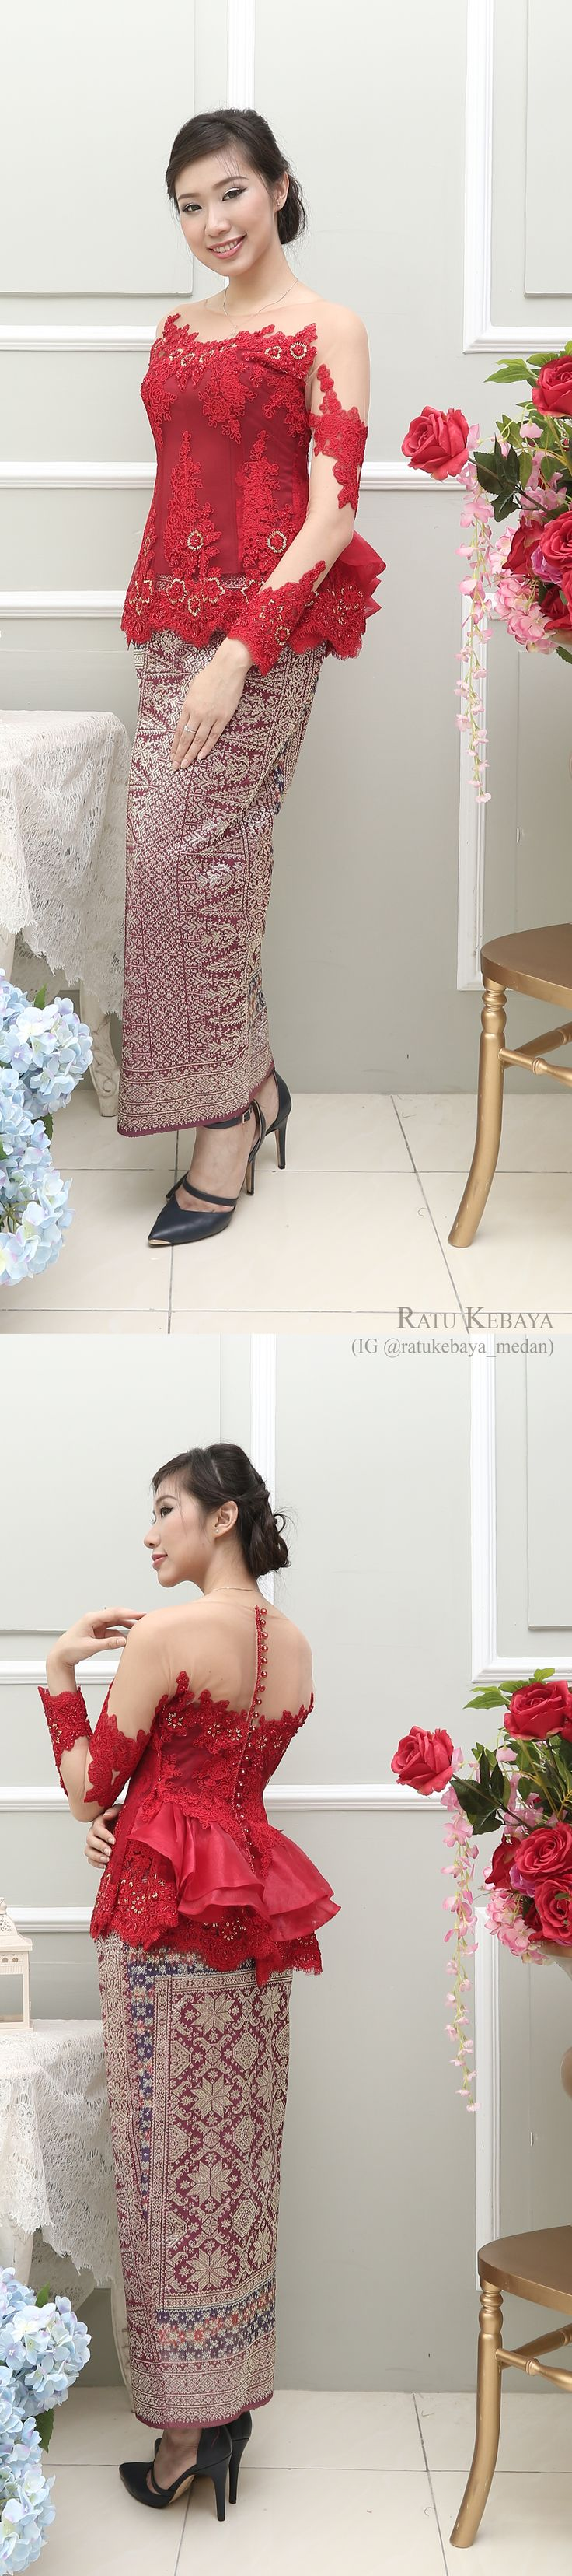 Kebaya @ratukebaya_medan. Padanan lace dan songket Palembang